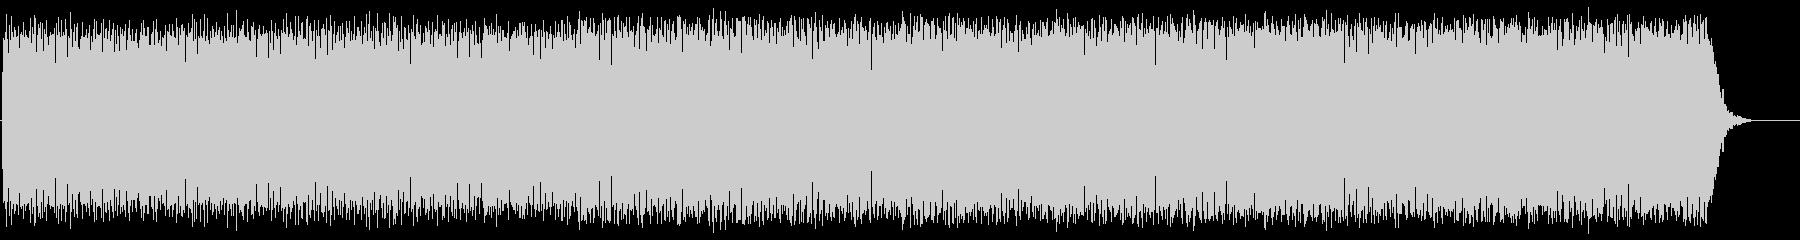 Uplifting techno sound's unreproduced waveform